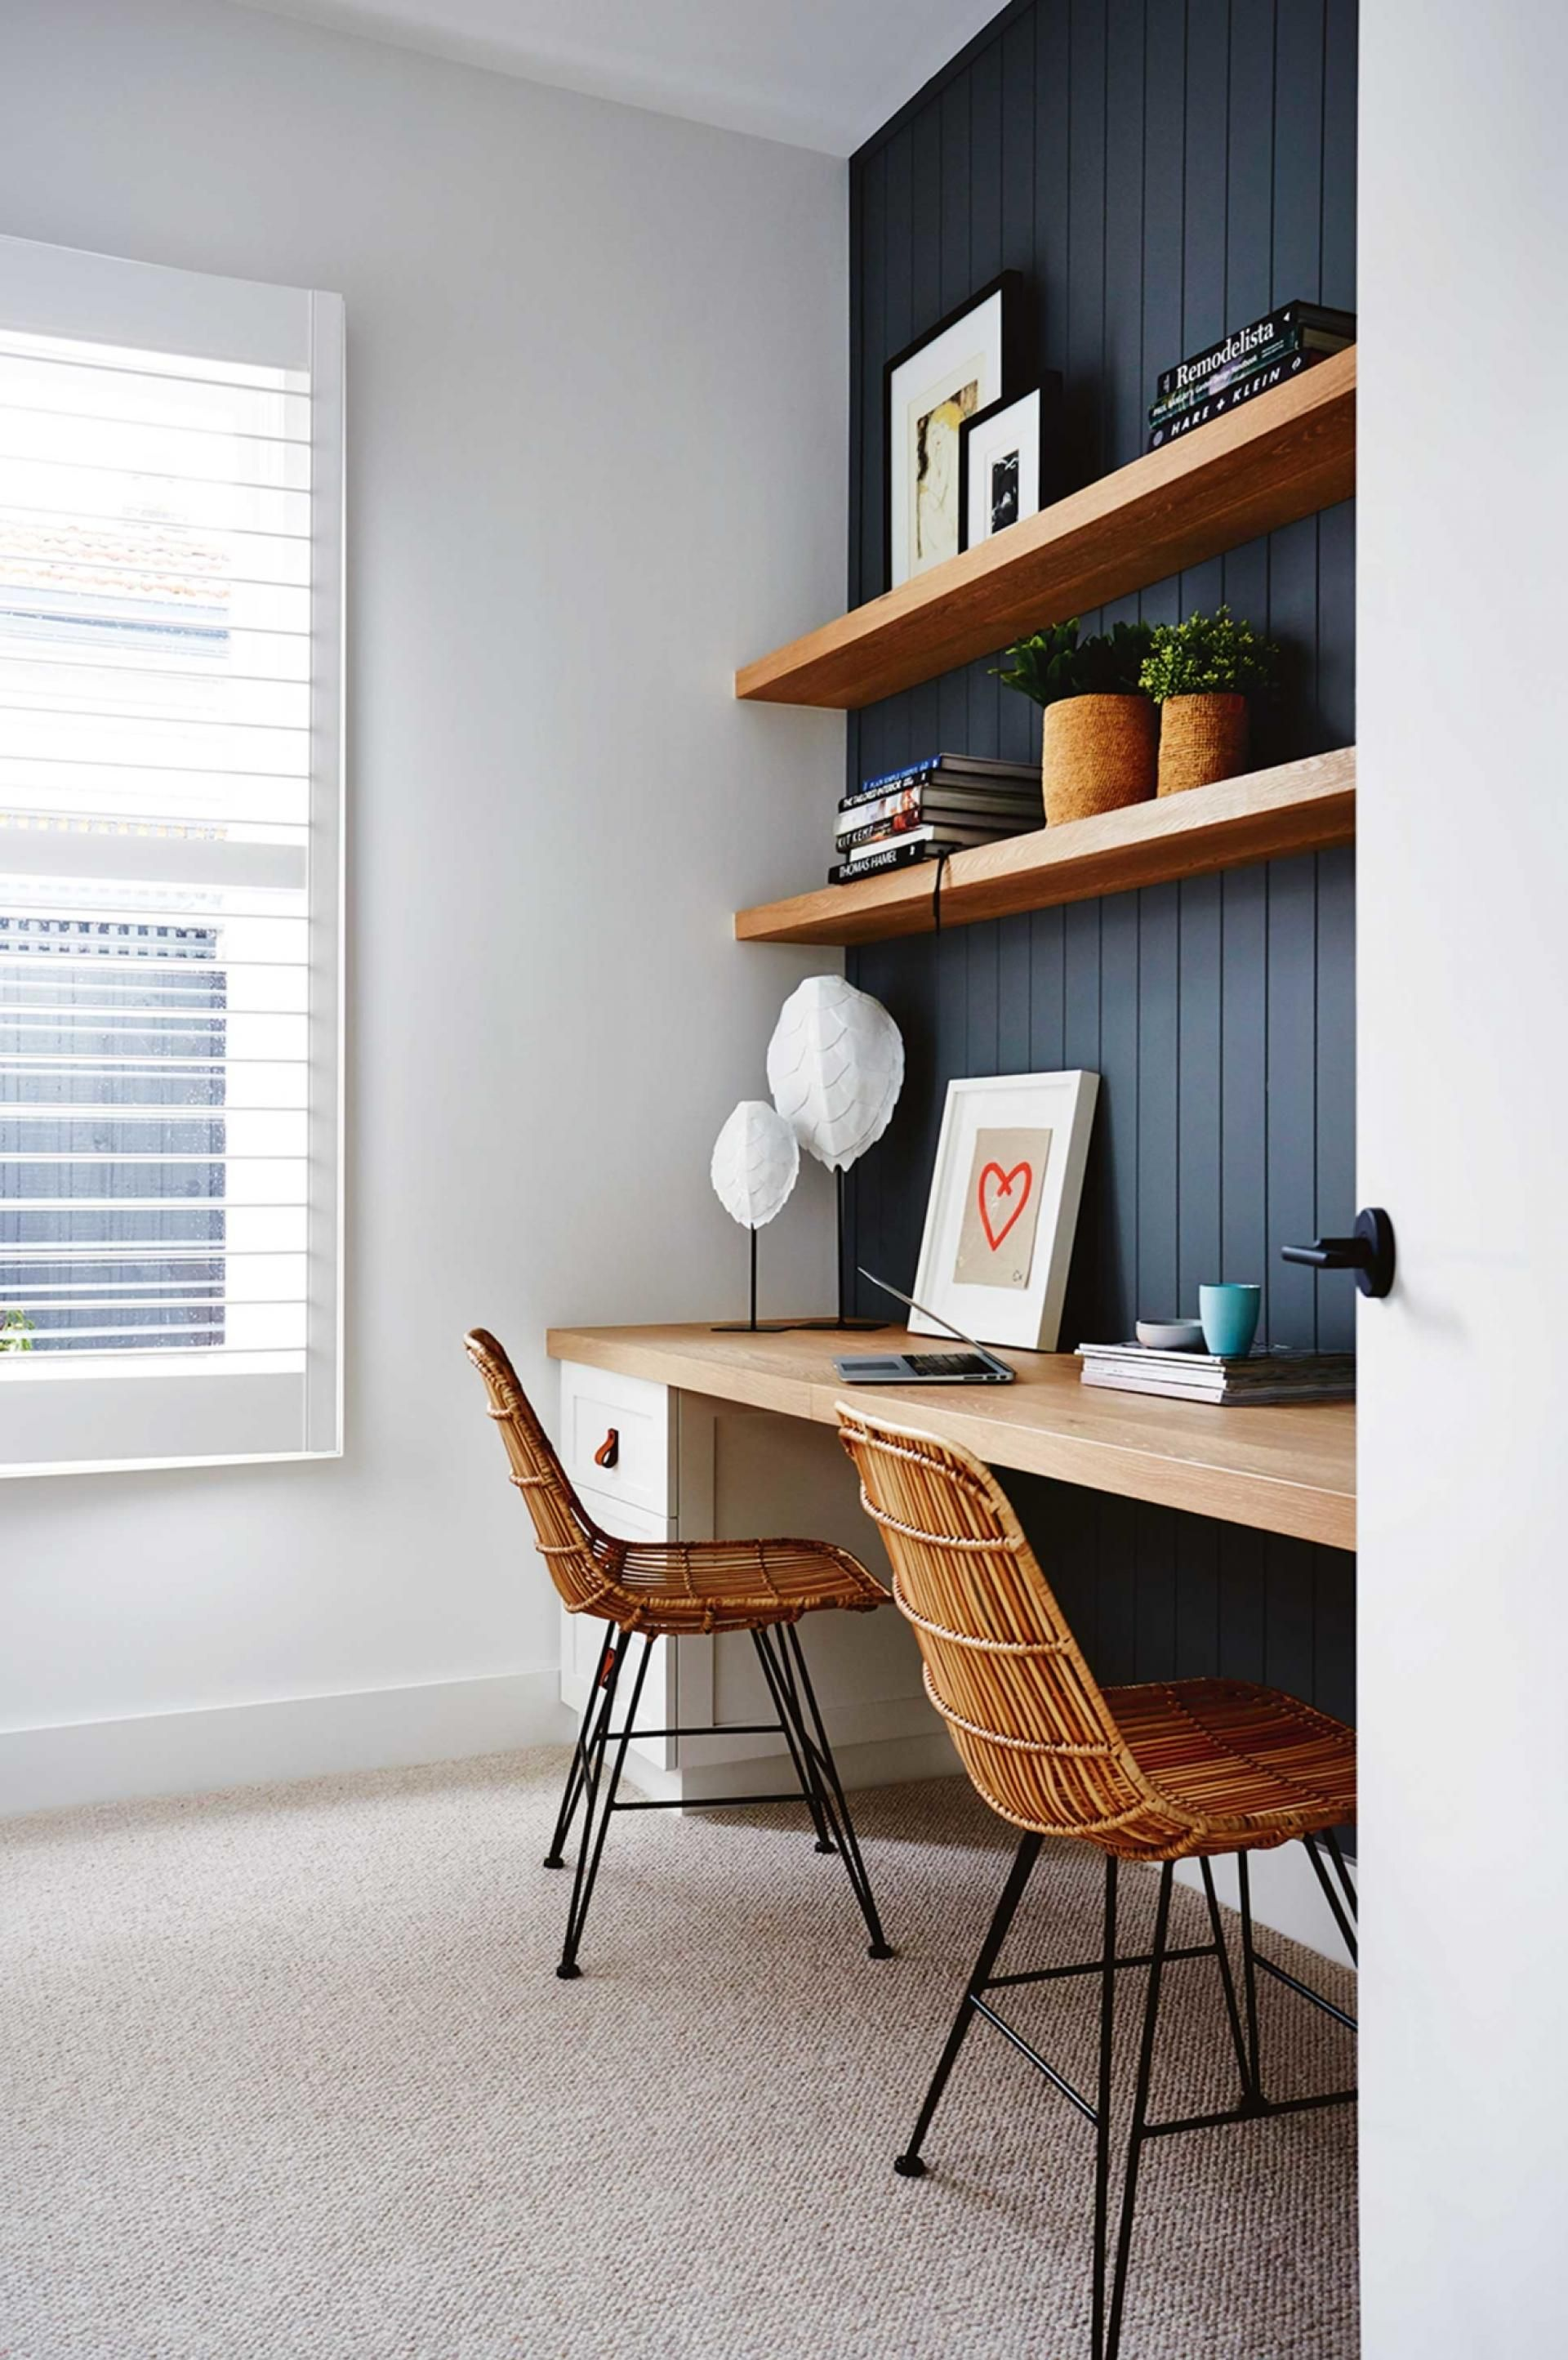 Navy Paneled Wall Behind Desks Open Wood Shelving Long Wood Desk